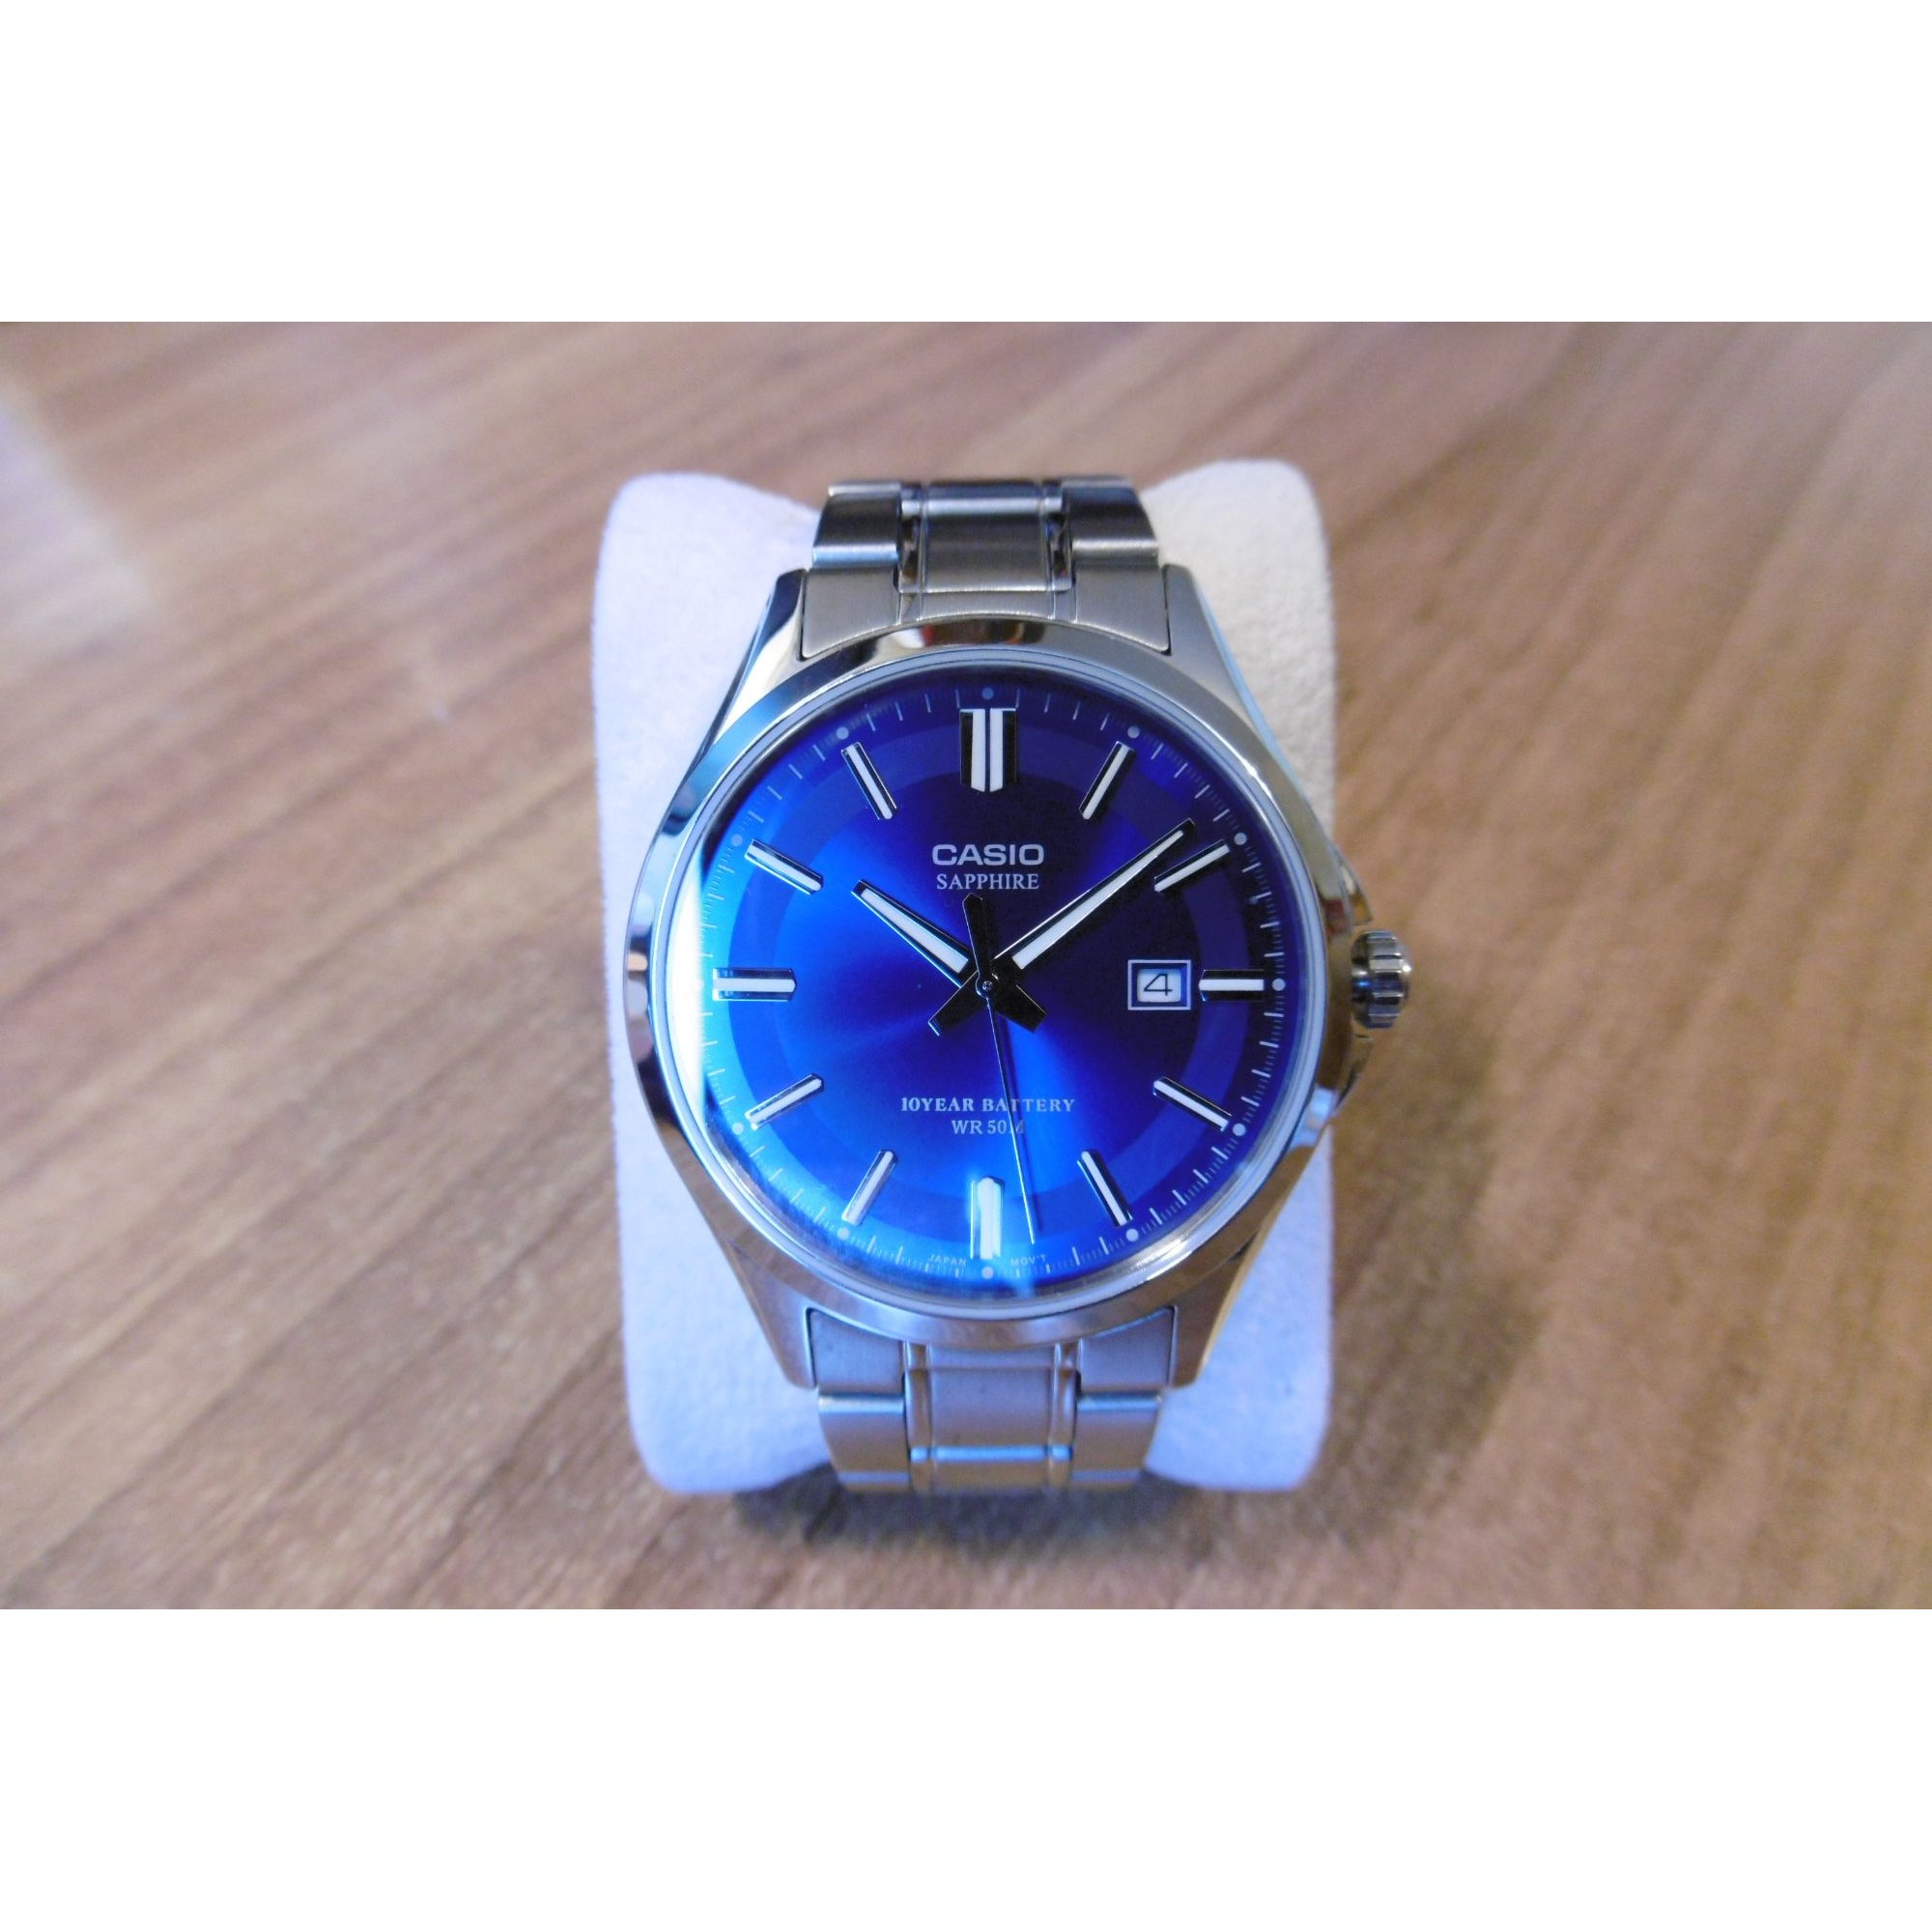 Montre au poignet CASIO Bleu, bleu marine, bleu turquoise